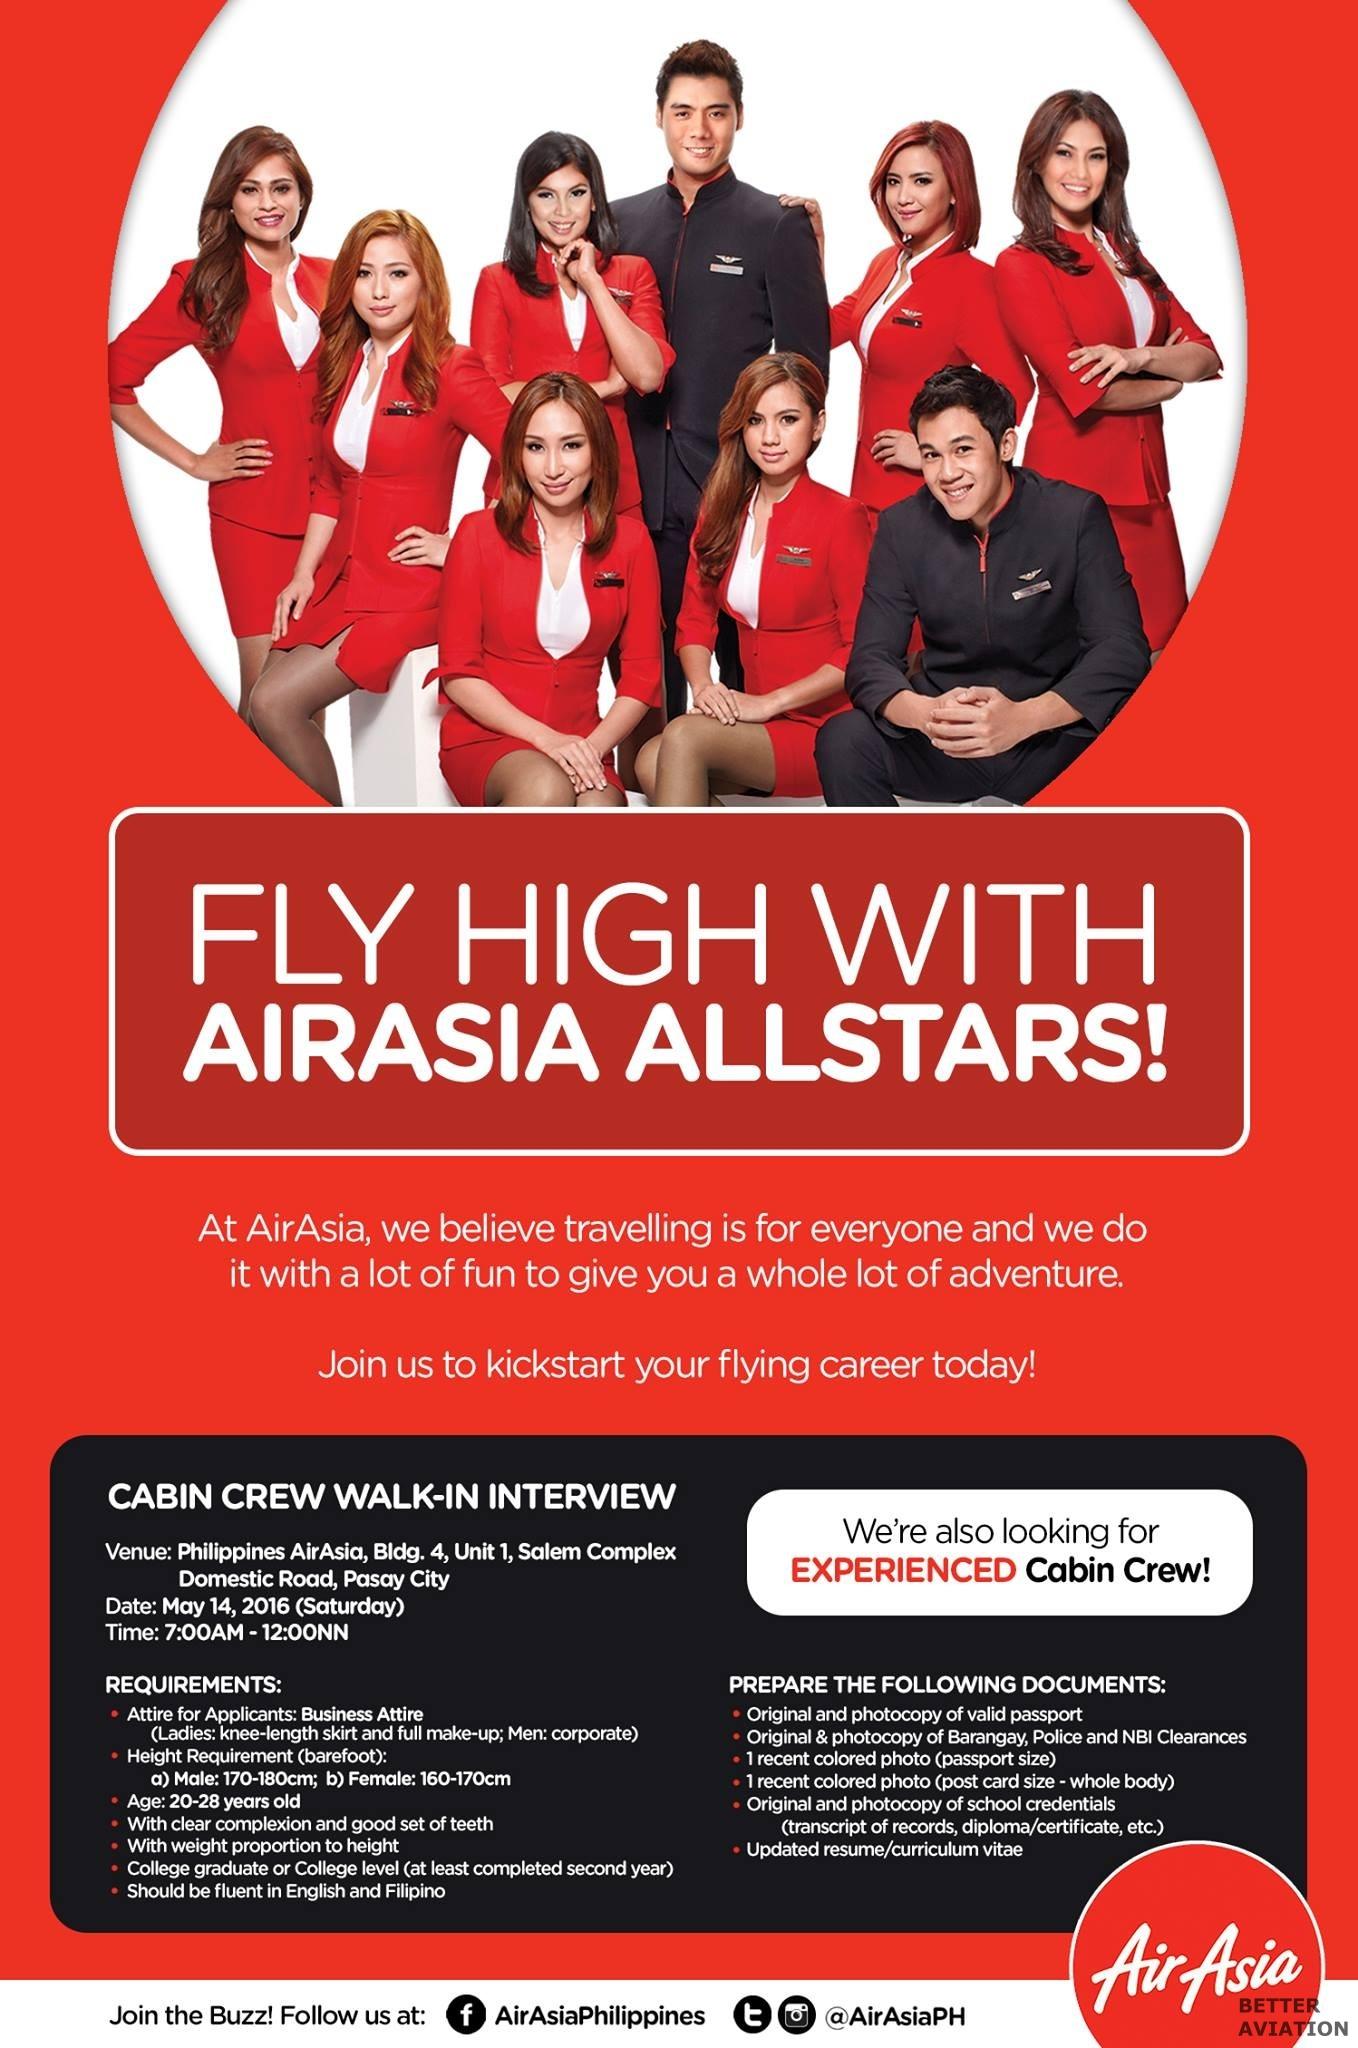 AirAsia Philippine Cabin Crew May 2016